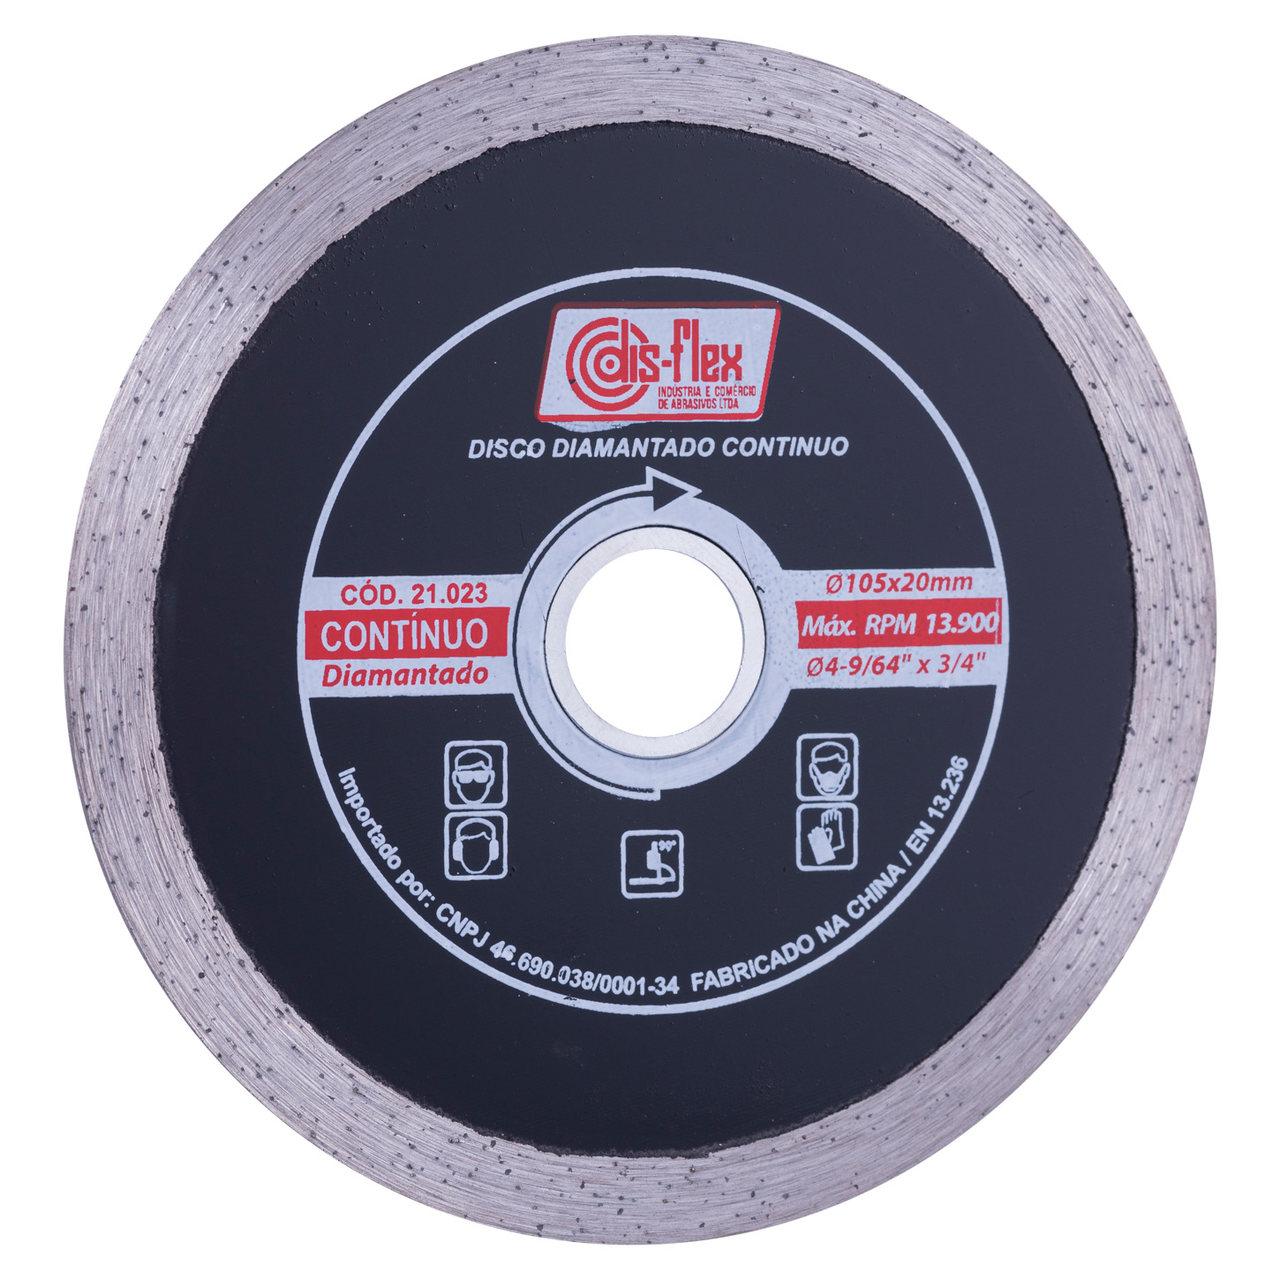 Disco Diamantado Continuo Disflex 105mm